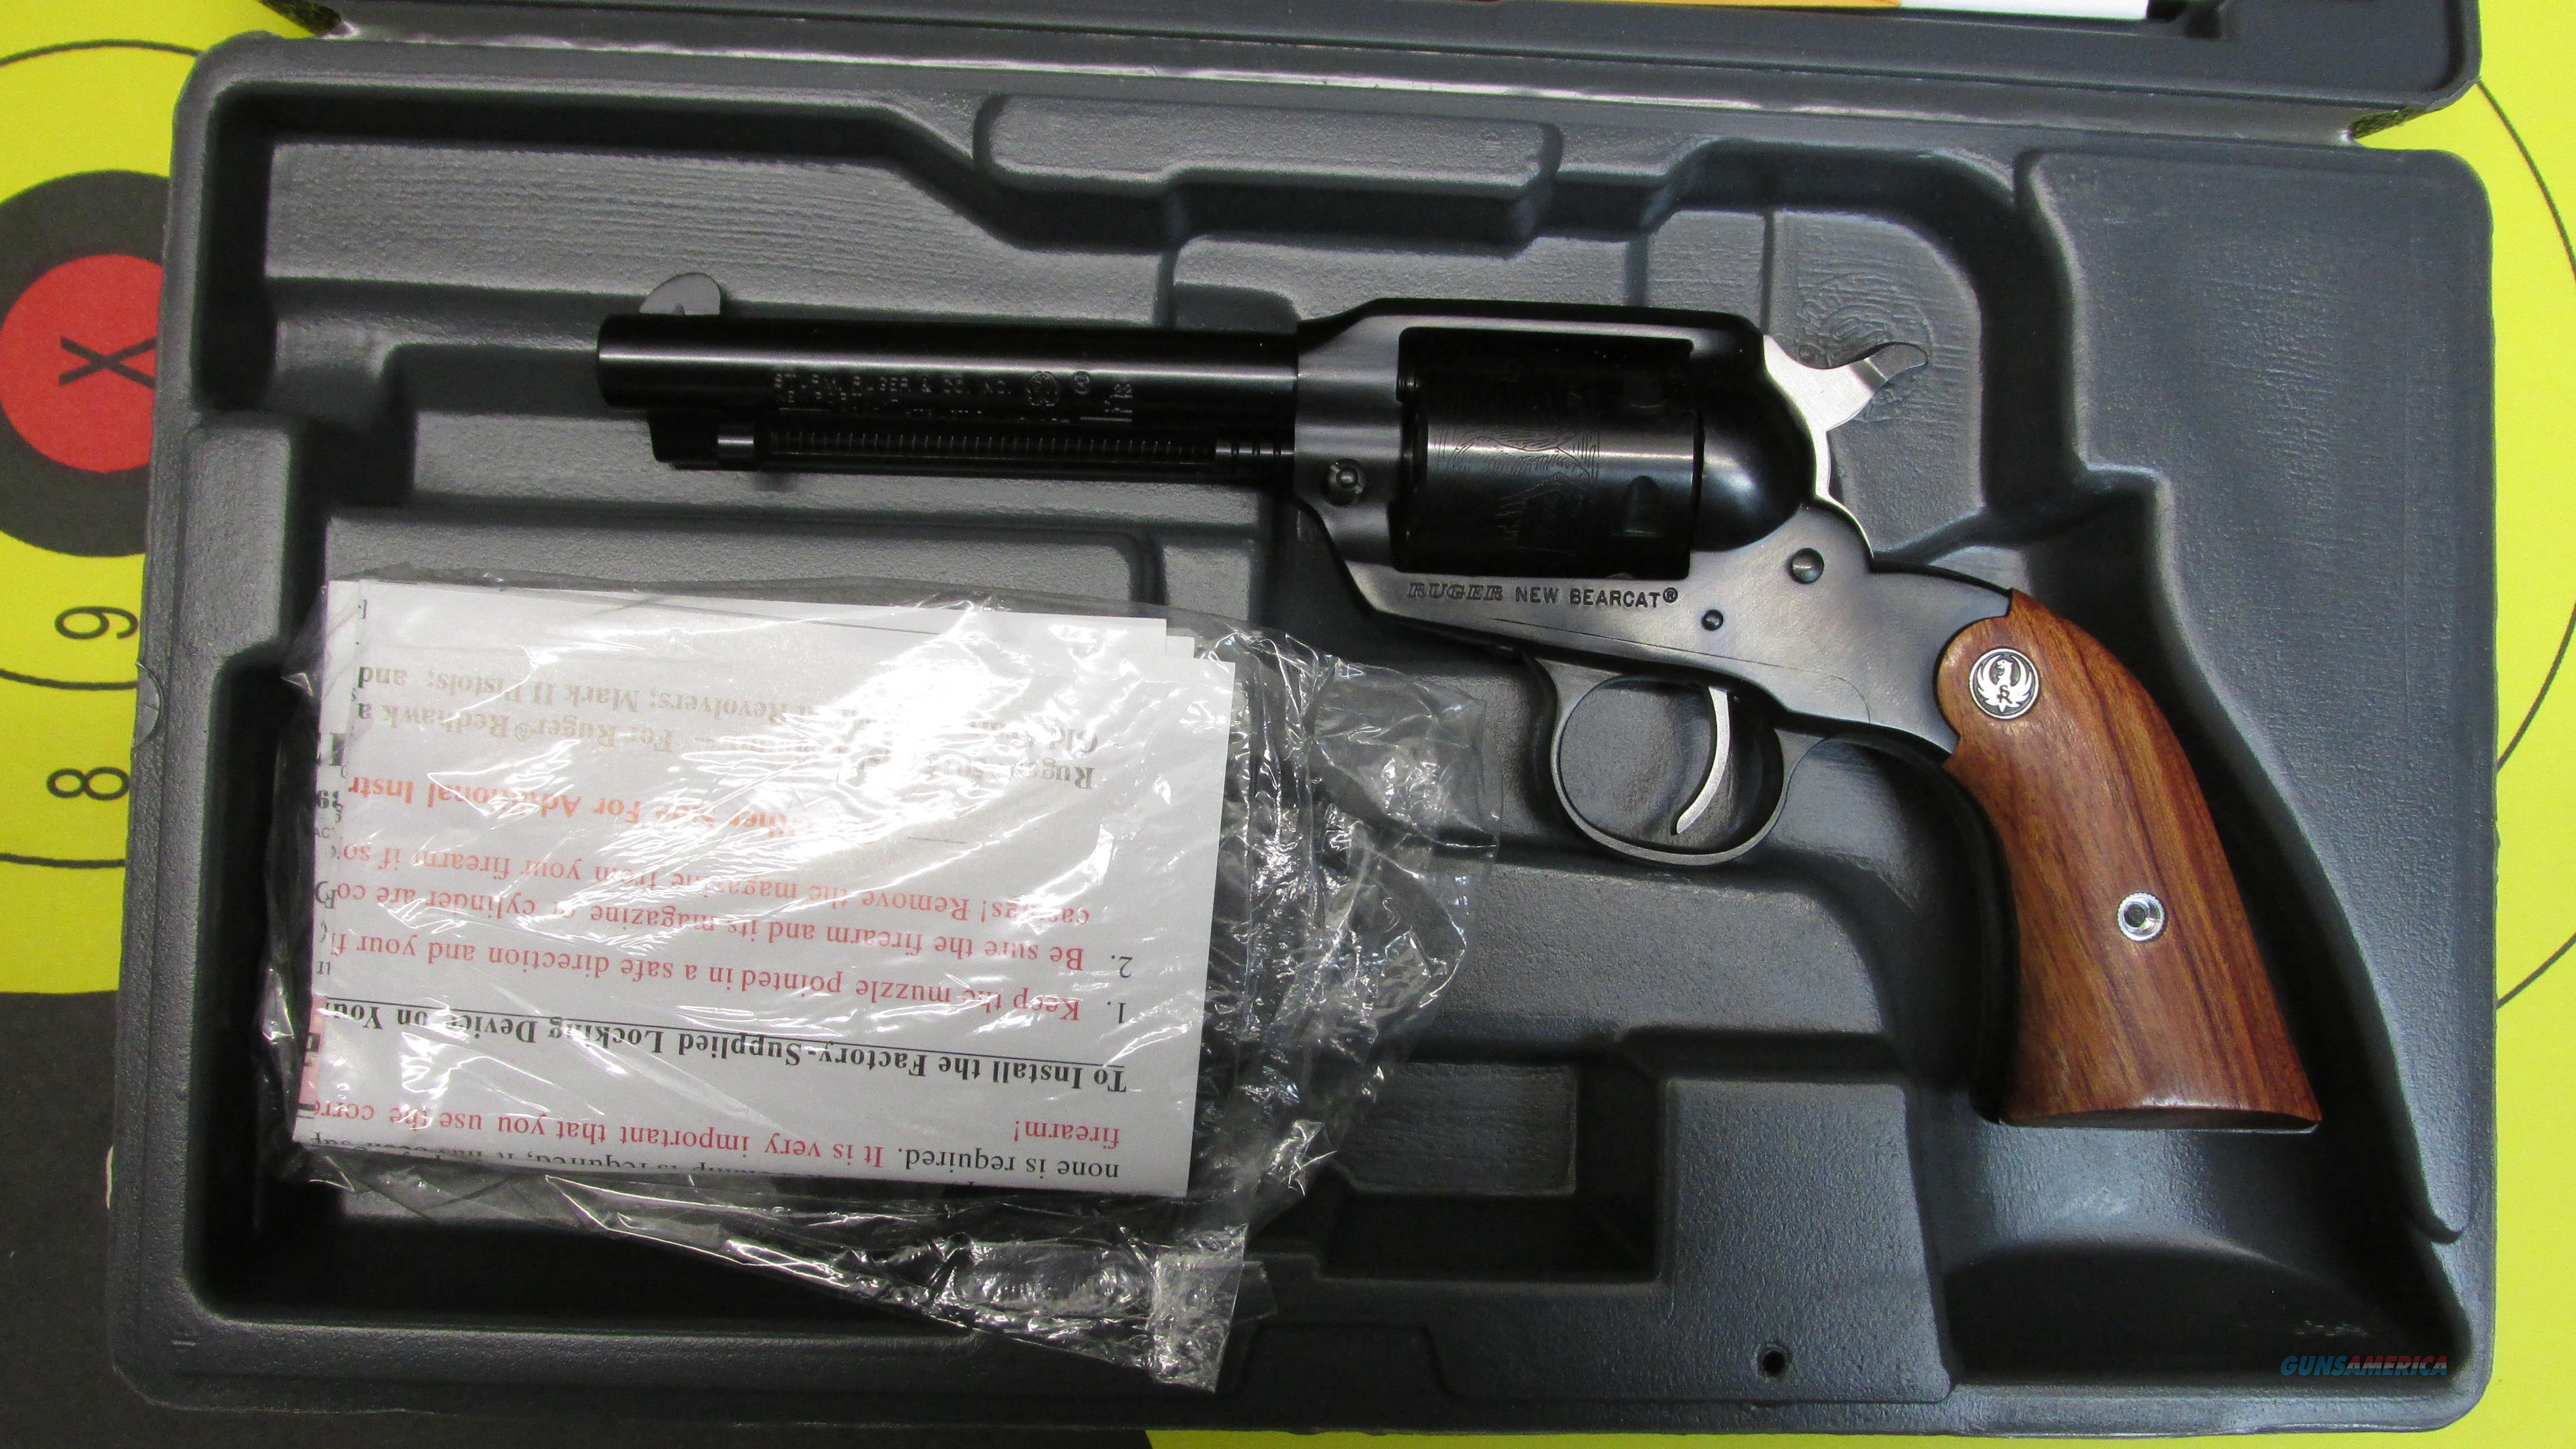 Ruger Bearcat 22LR Revolver  Guns > Pistols > Ruger Single Action Revolvers > Bearcat